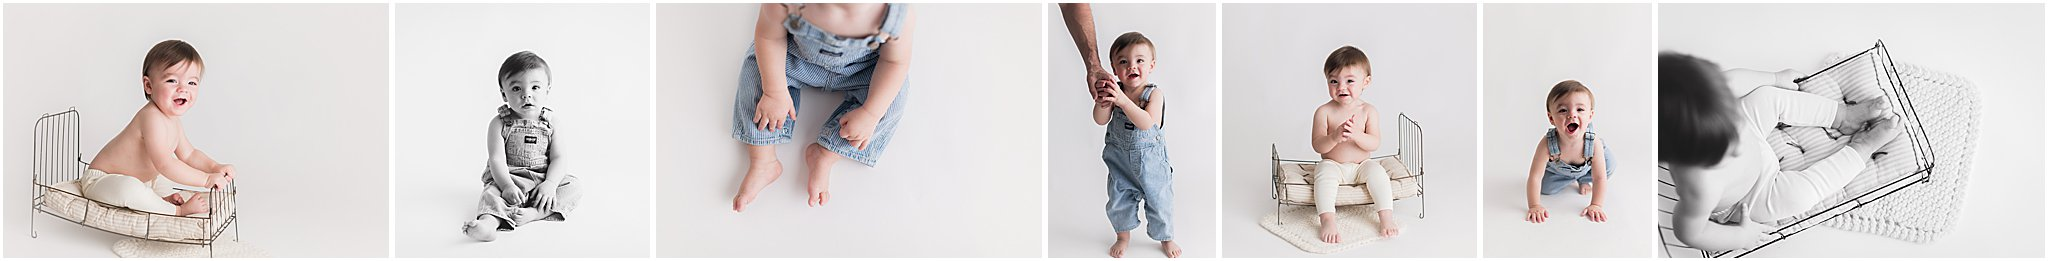 Appleton Child Photography